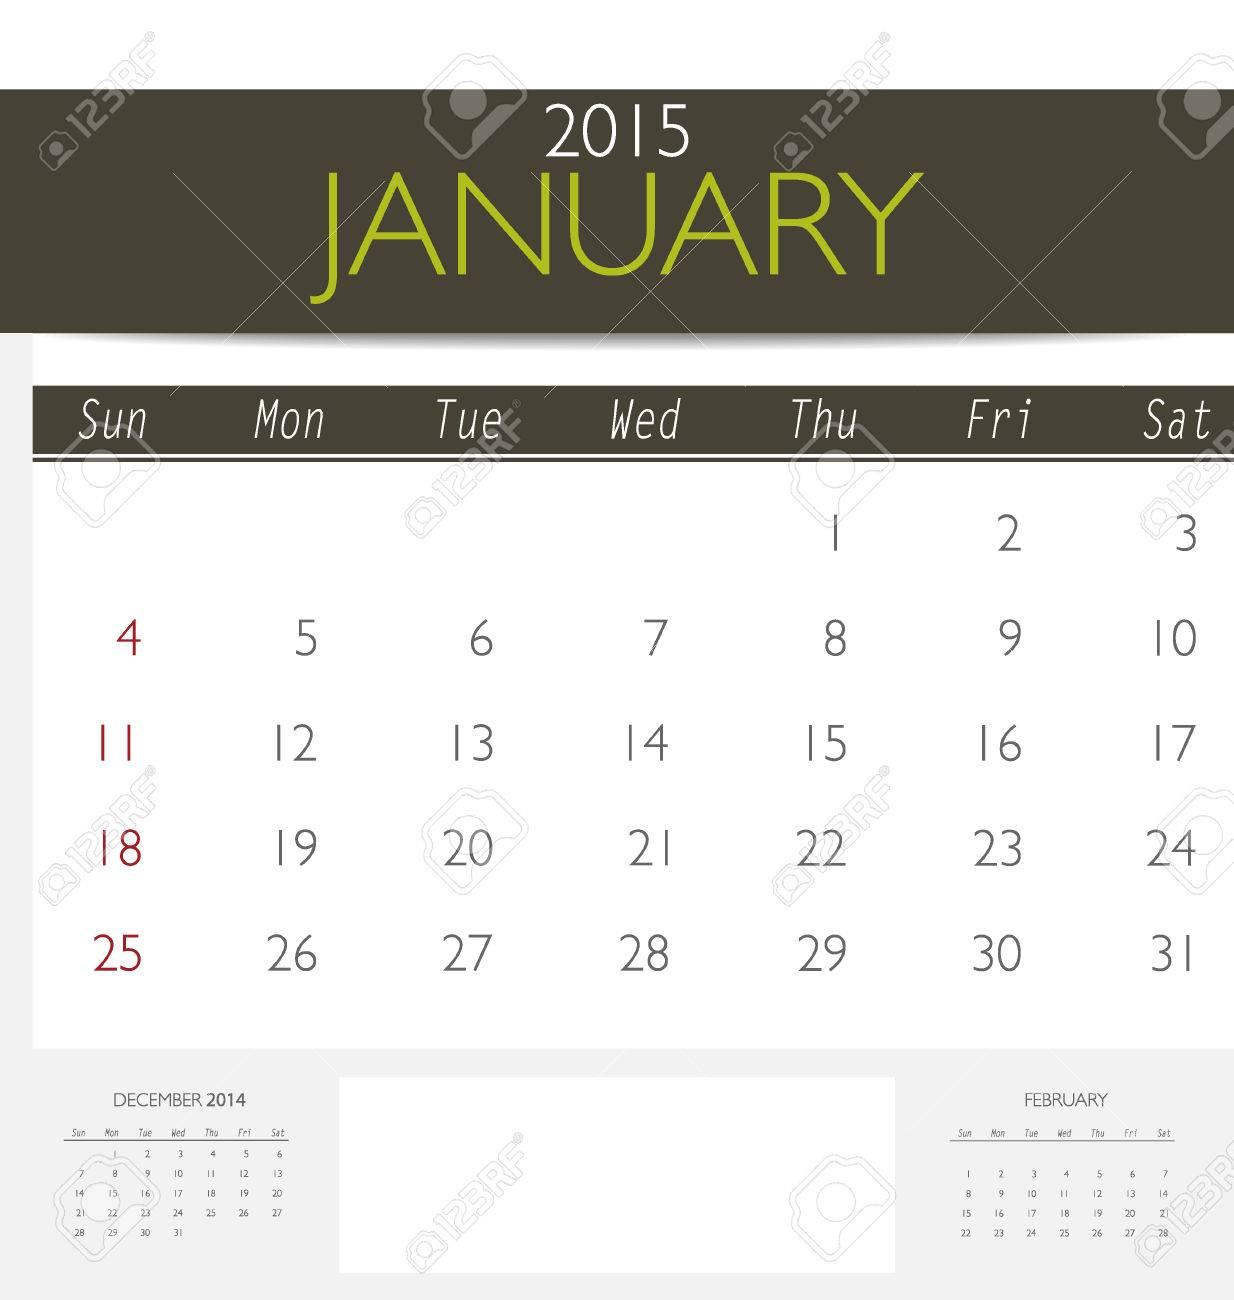 2015 Calendar Monthly Calendar Template For January Vector